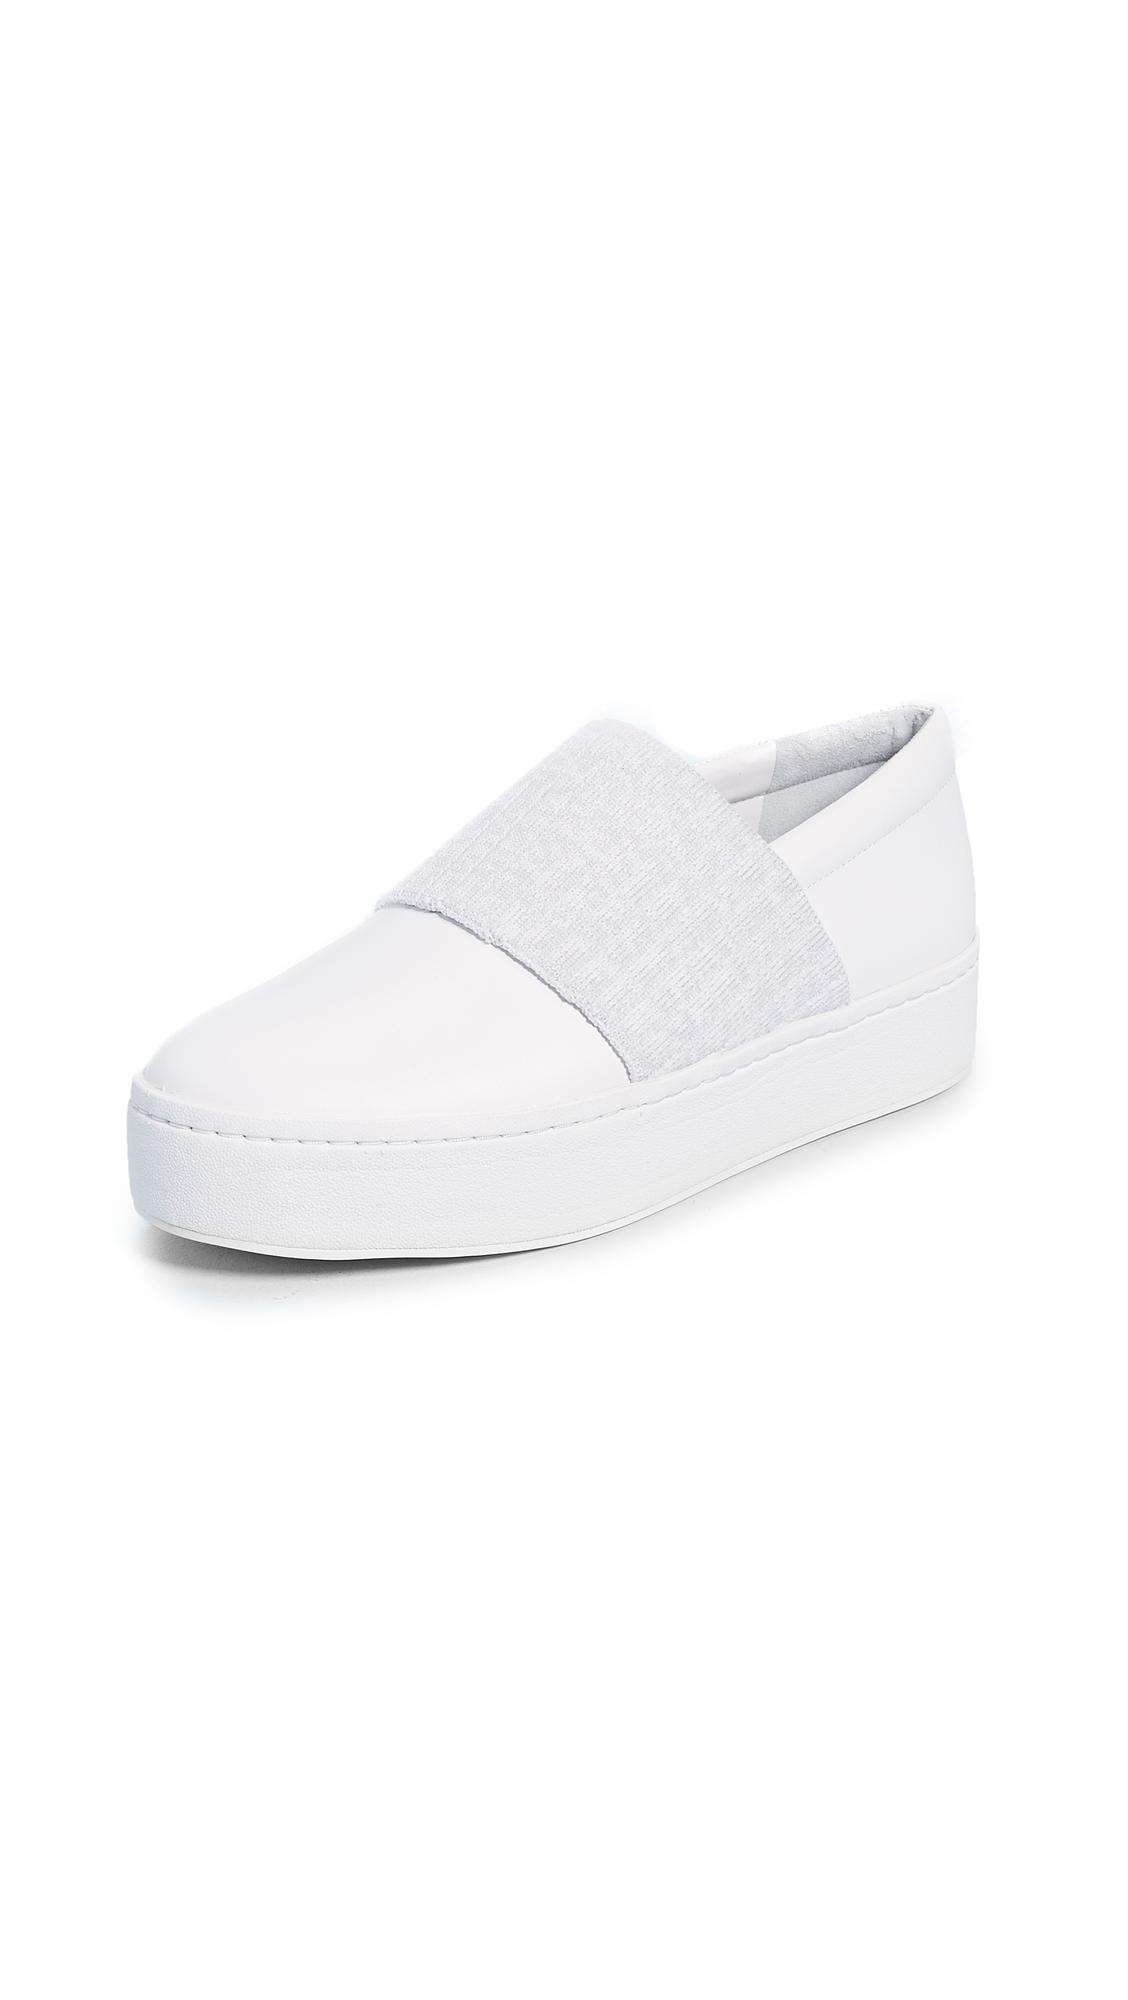 Vince Weadon Slip On Sneakers - Horchata